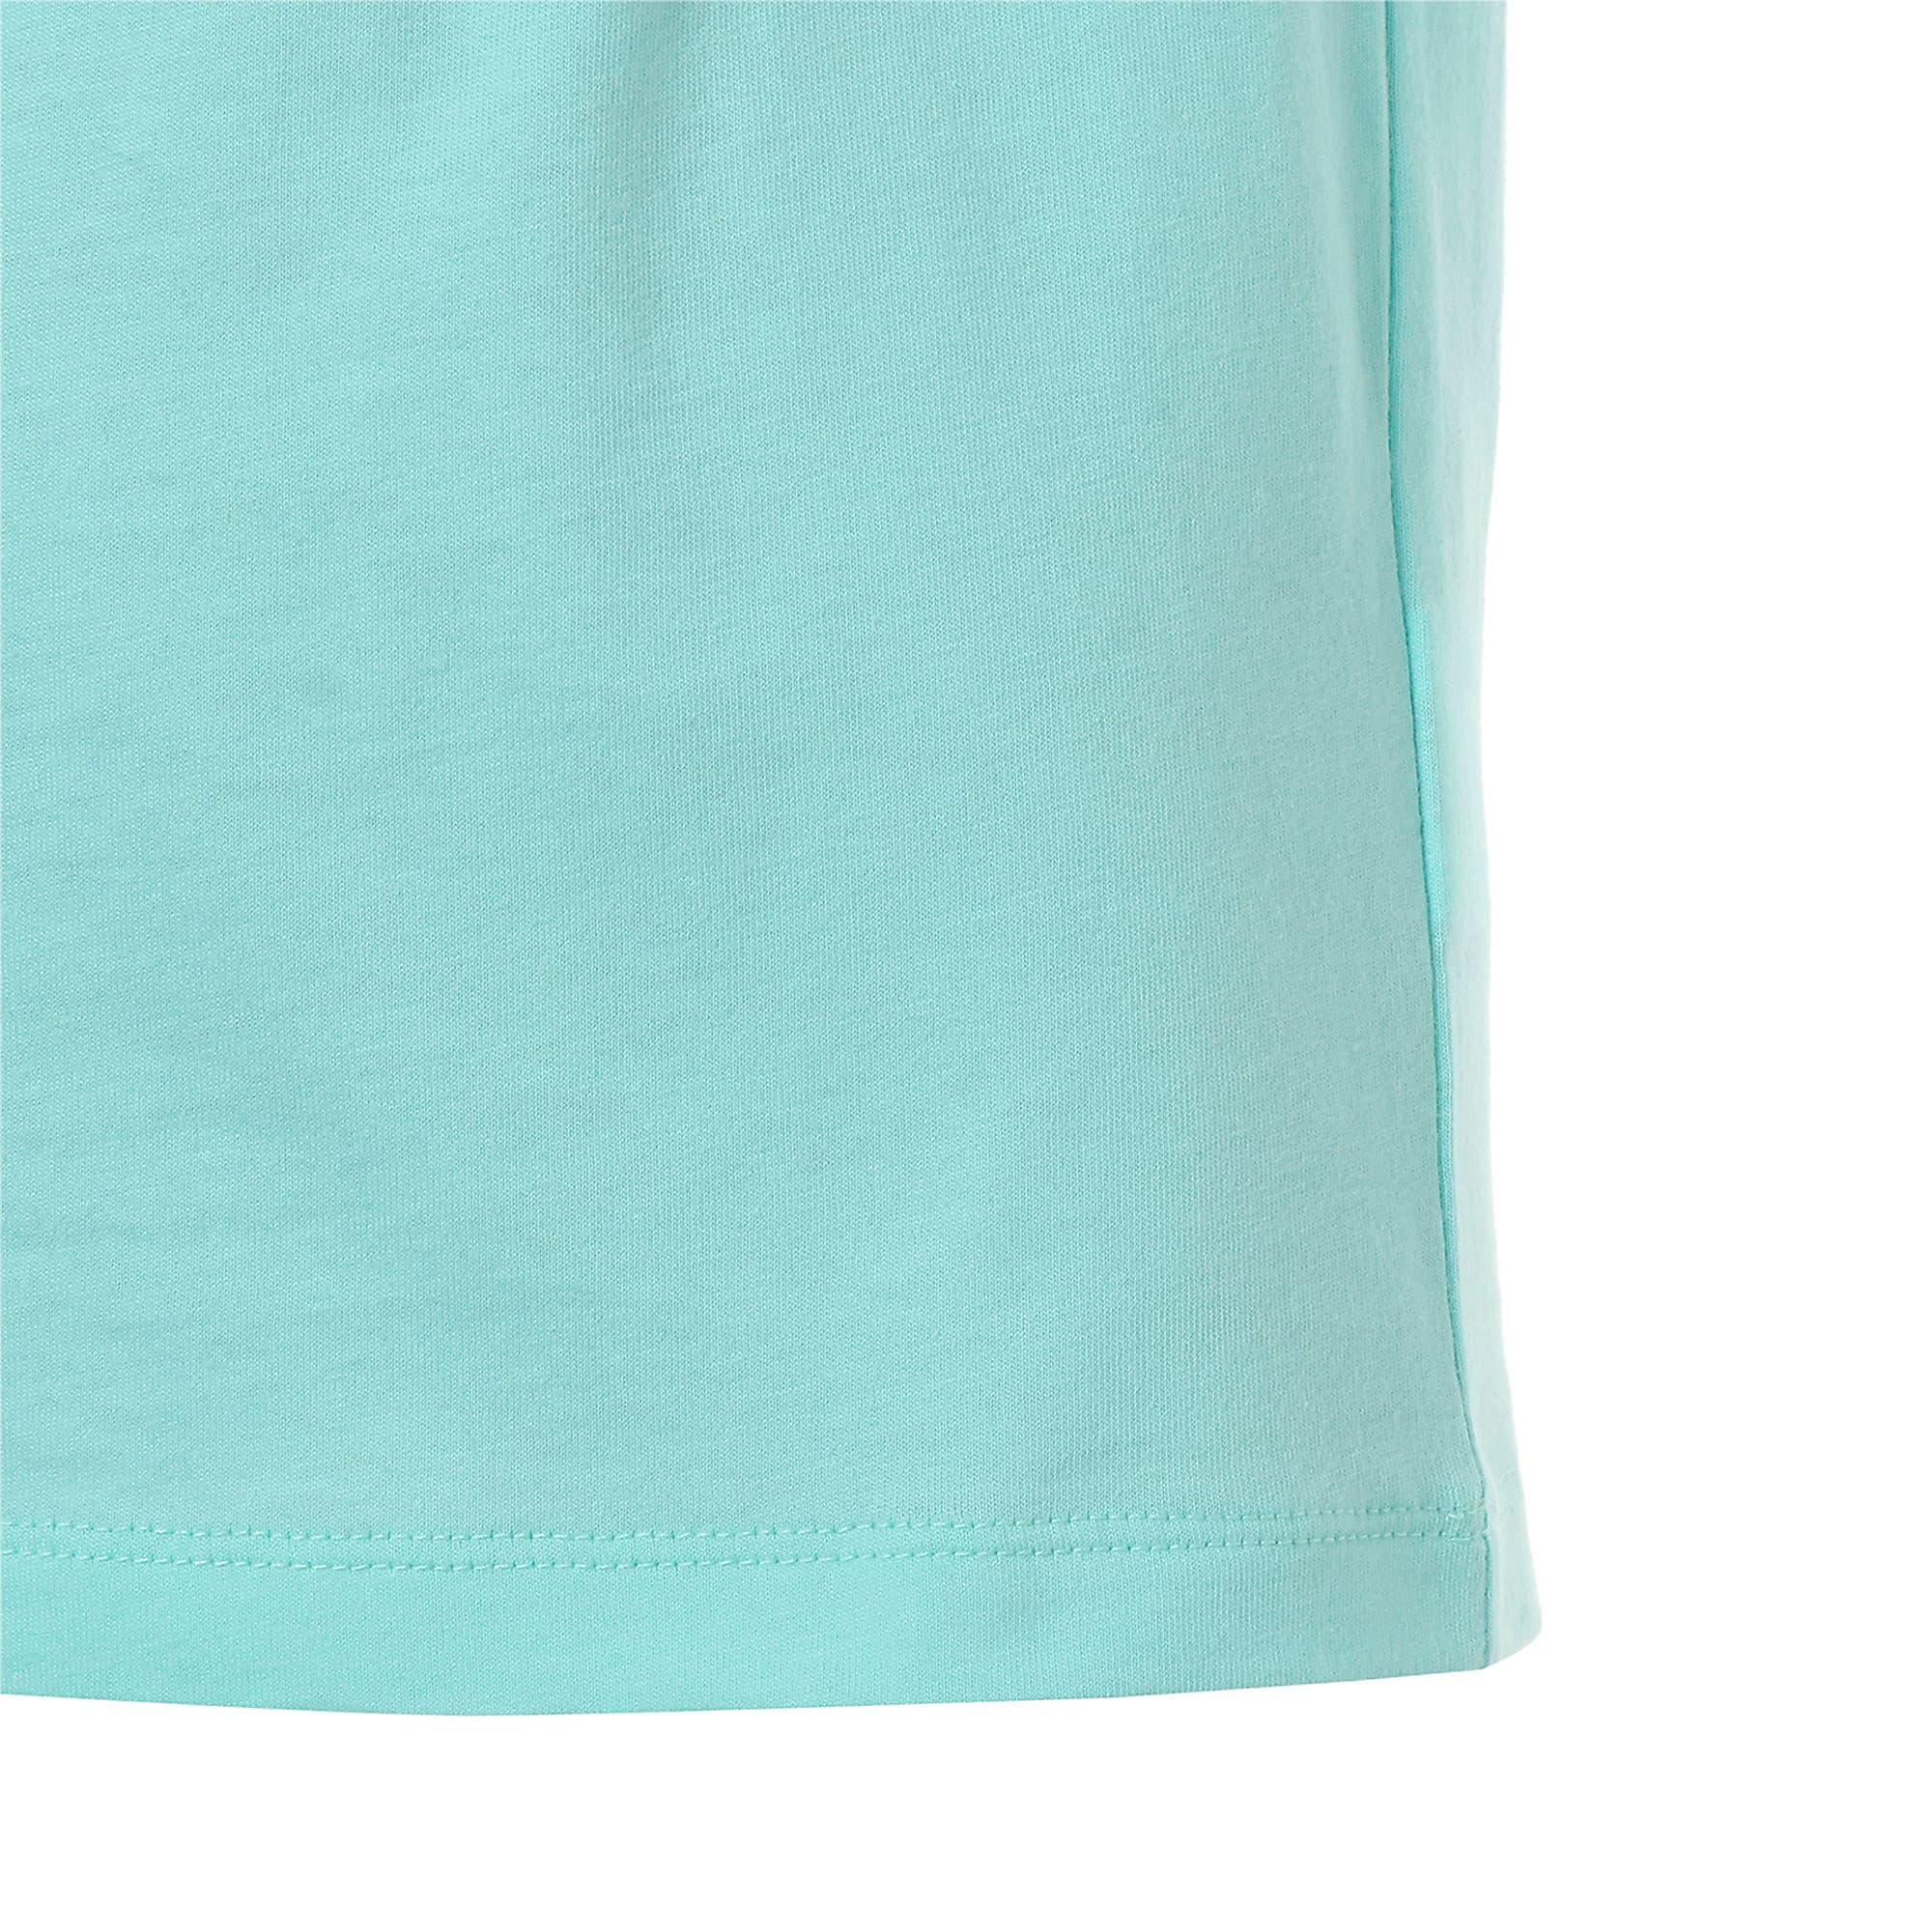 Thumbnail 6 of キッズ PUMA x DIAMOND Tシャツ, ARUBA BLUE, medium-JPN